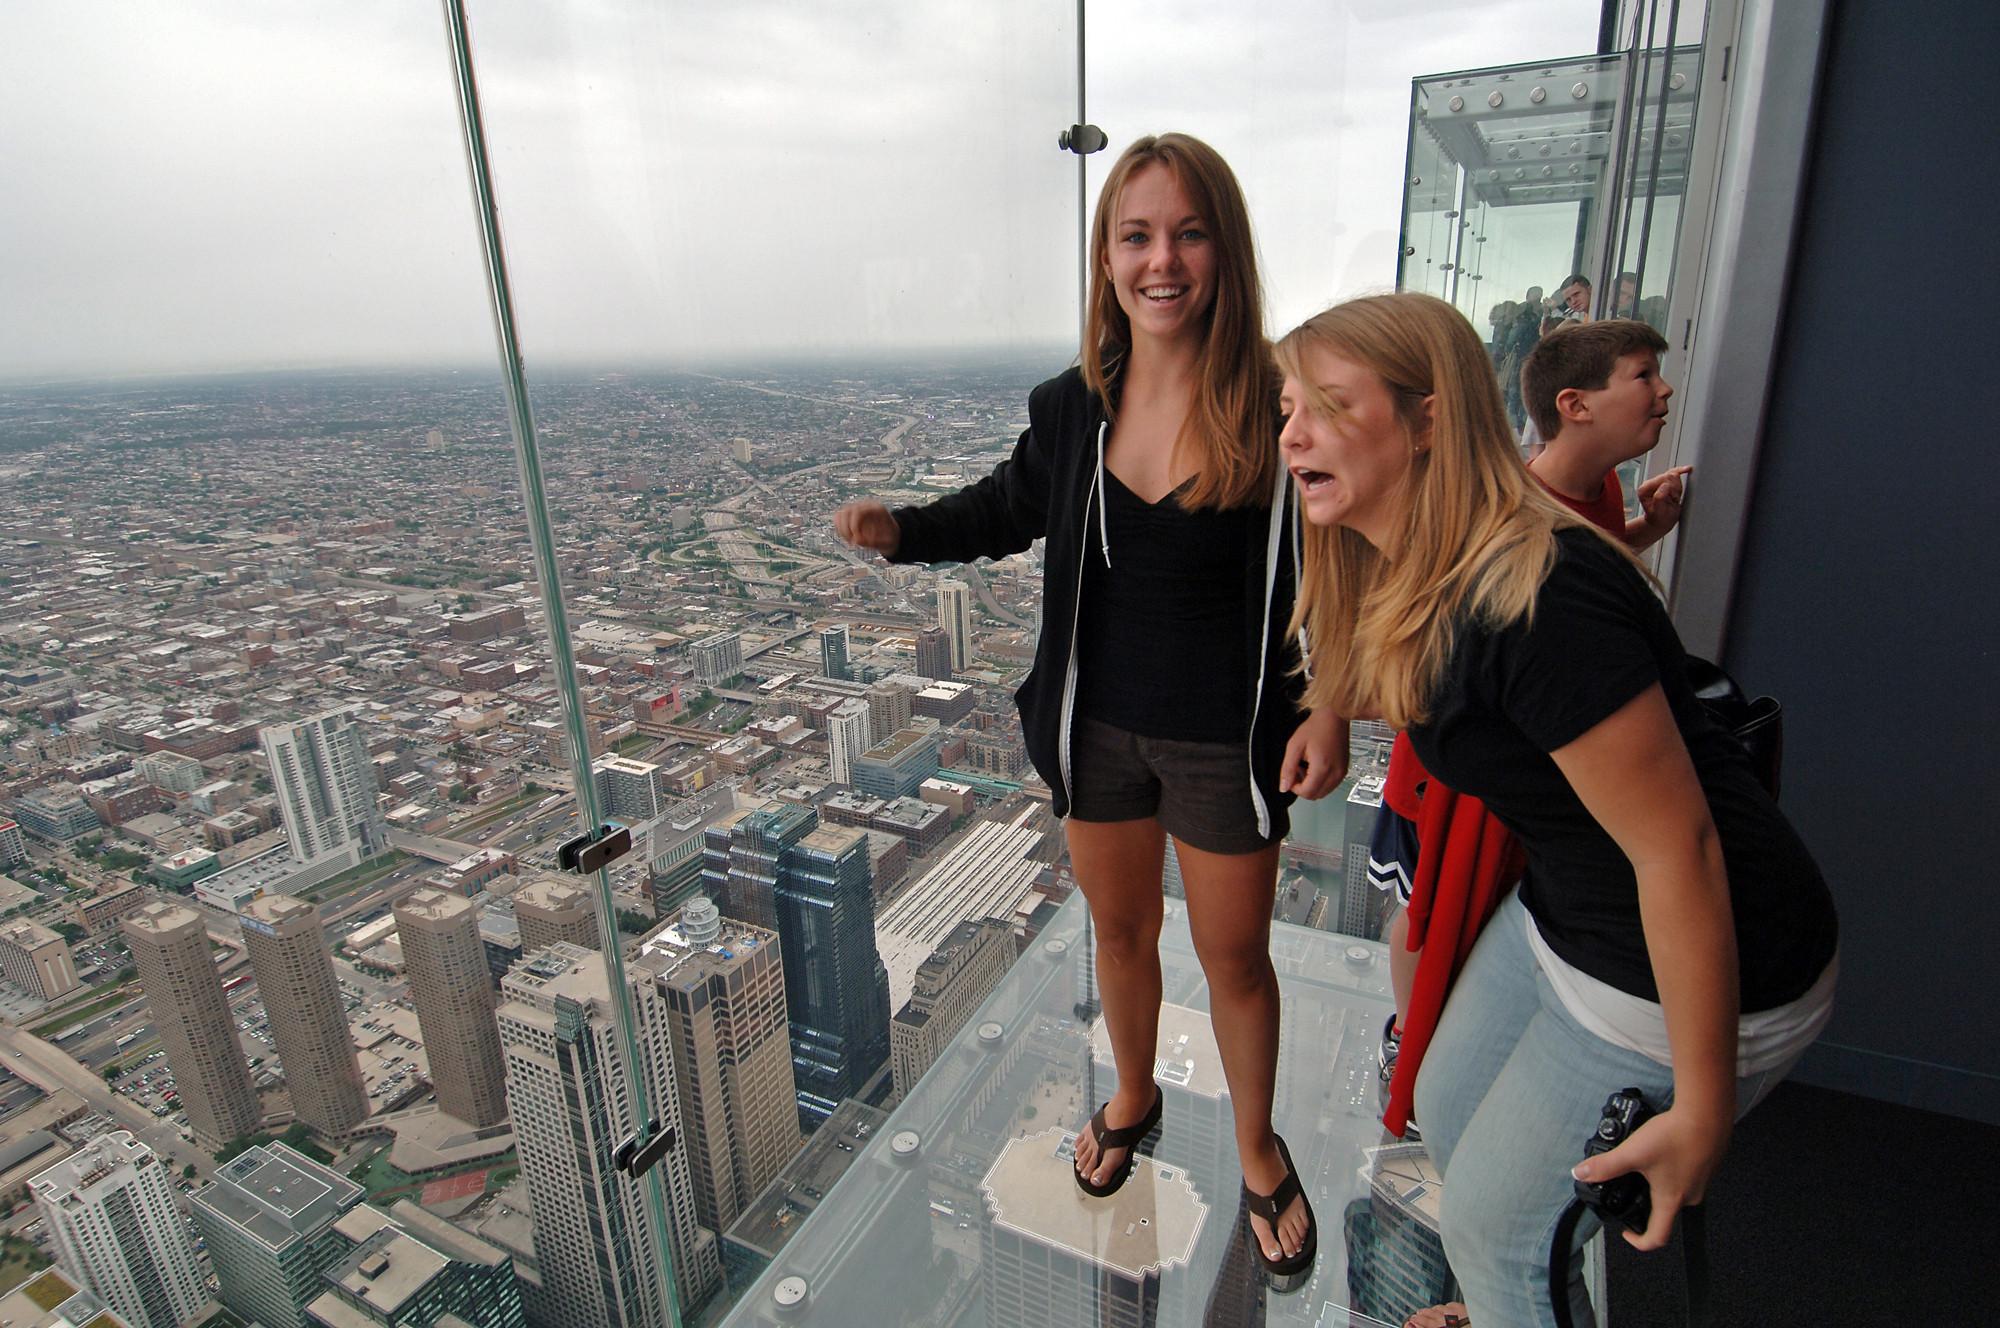 Cracking Heard On Willis Tower Glass Ledge Scares Calif